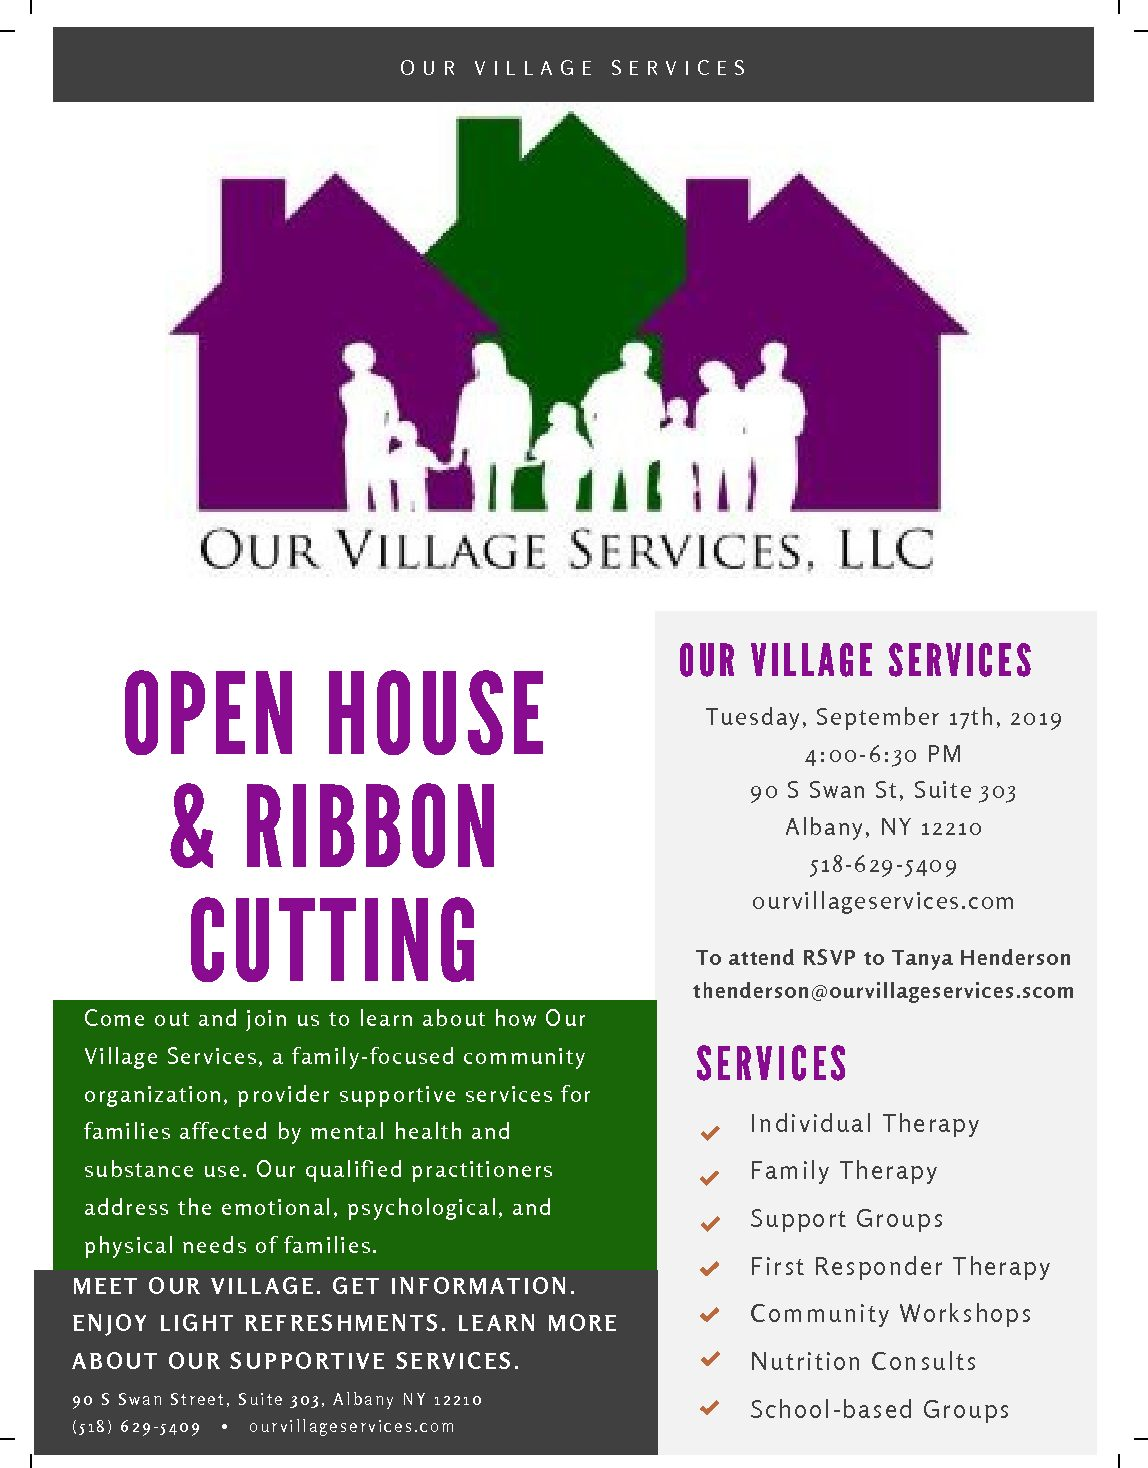 Open House & Ribbon Cutting